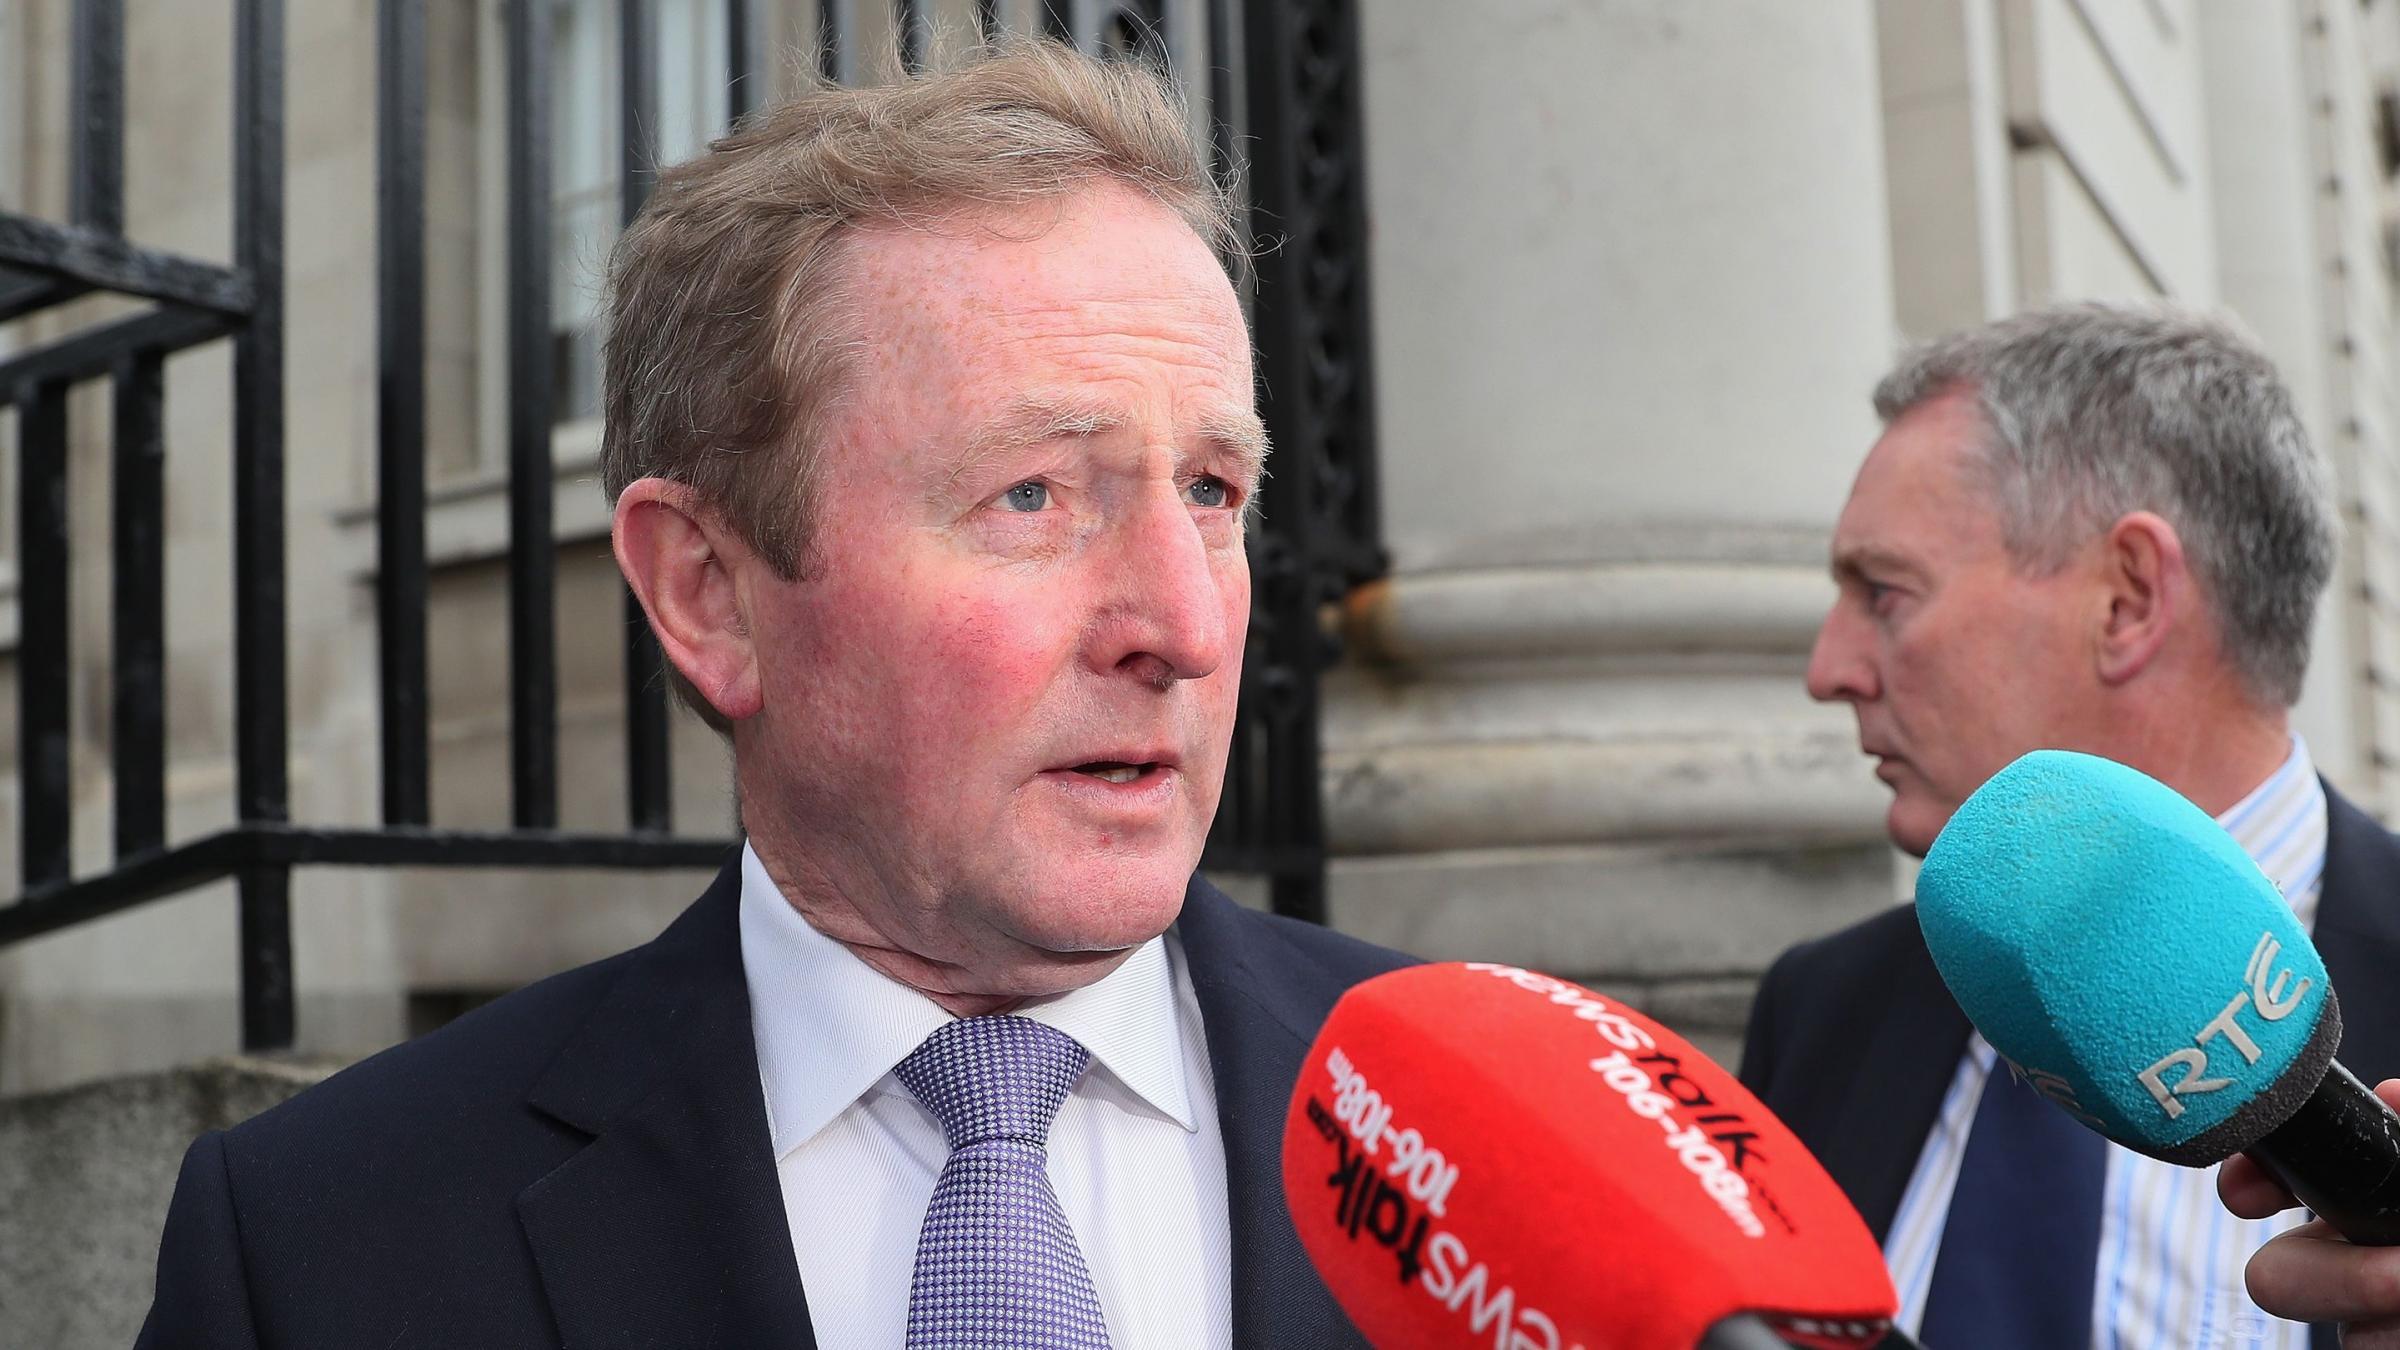 Leo Varadkar formally elected as prime minister of Ireland